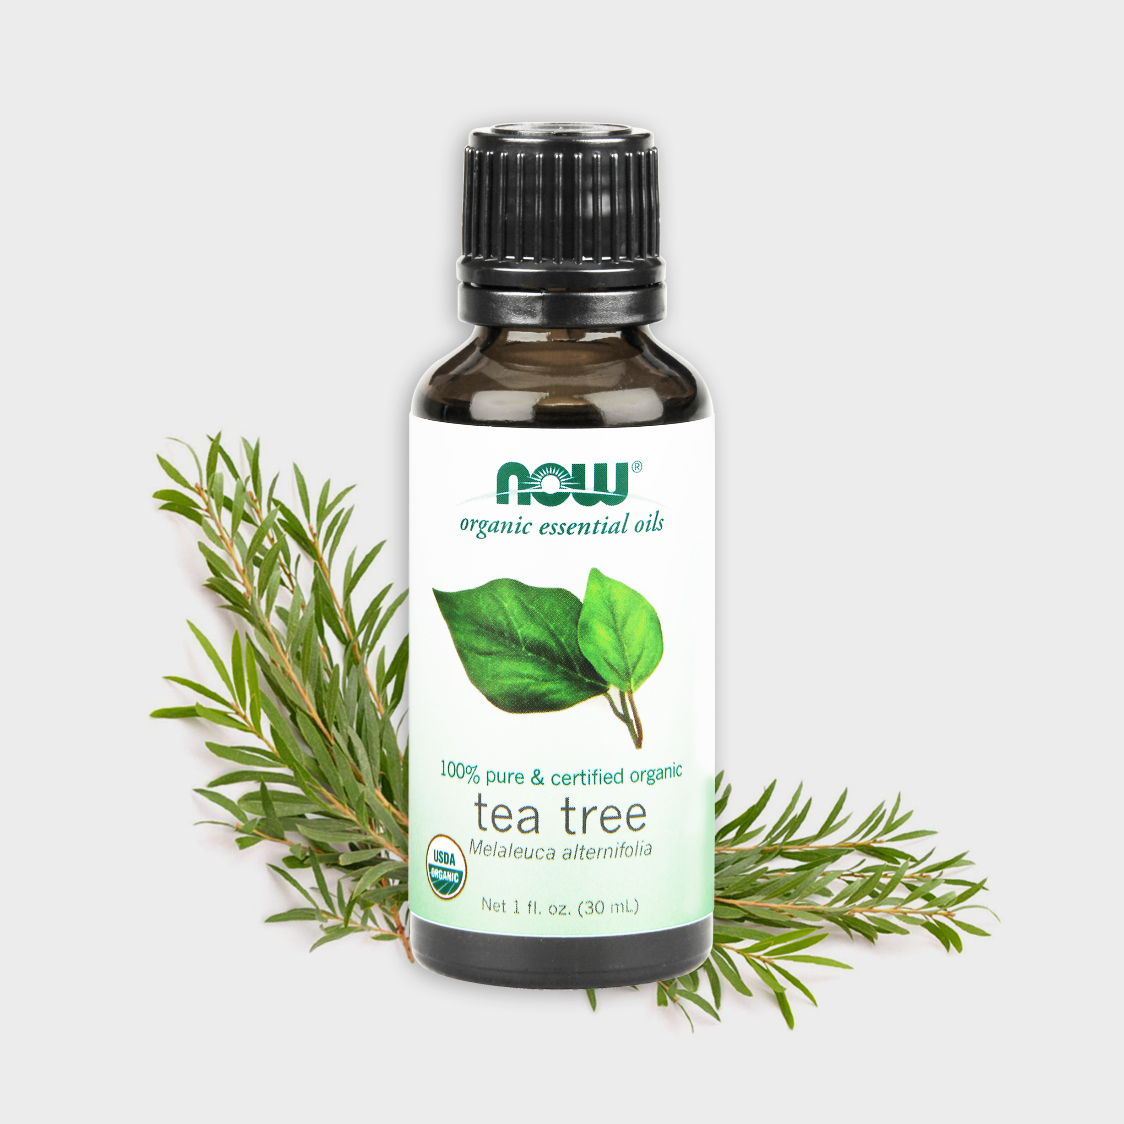 tinh-dau-tra-tram-now-organic-essential-oils-tea-tree-30ml